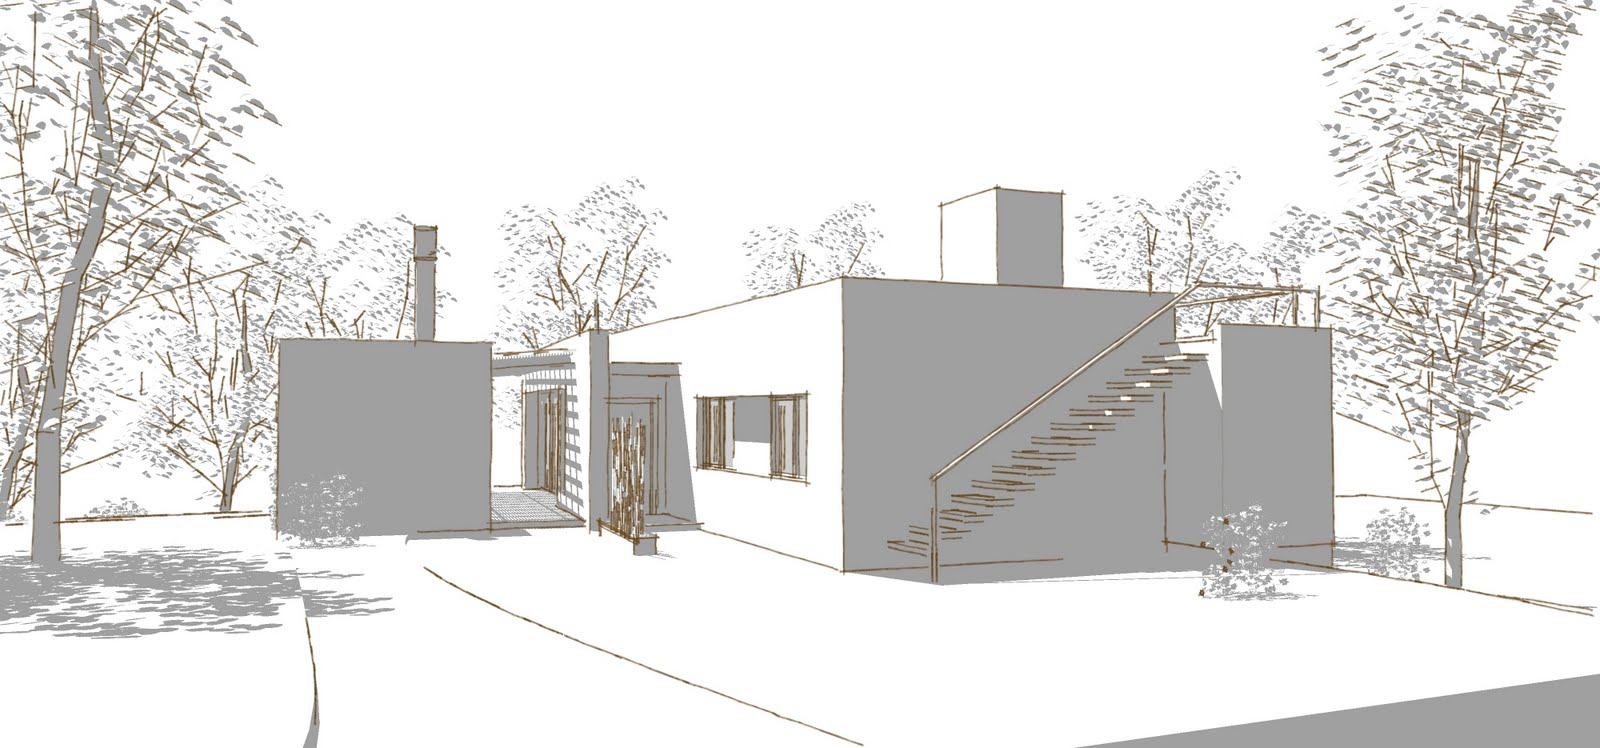 C s taller de arquitectura 04 13 for Portadas de arquitectura